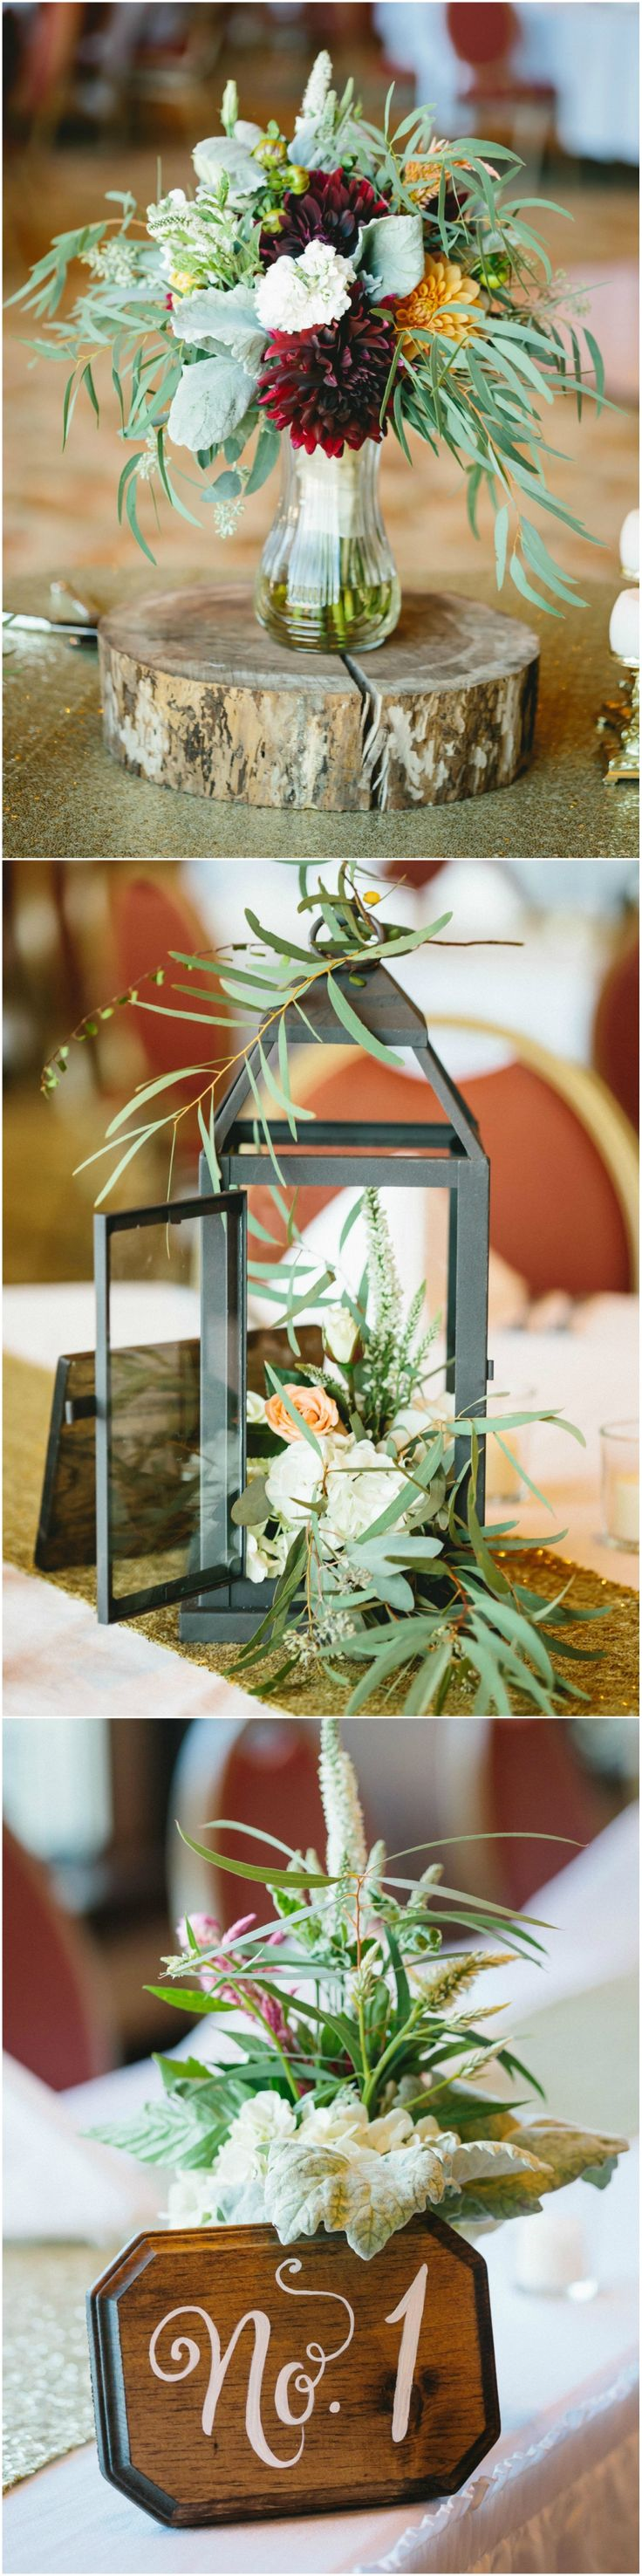 Rustic romance, wedding table centerpieces, burgundy dahlias, lantern, tree stump base // Be Light Photography